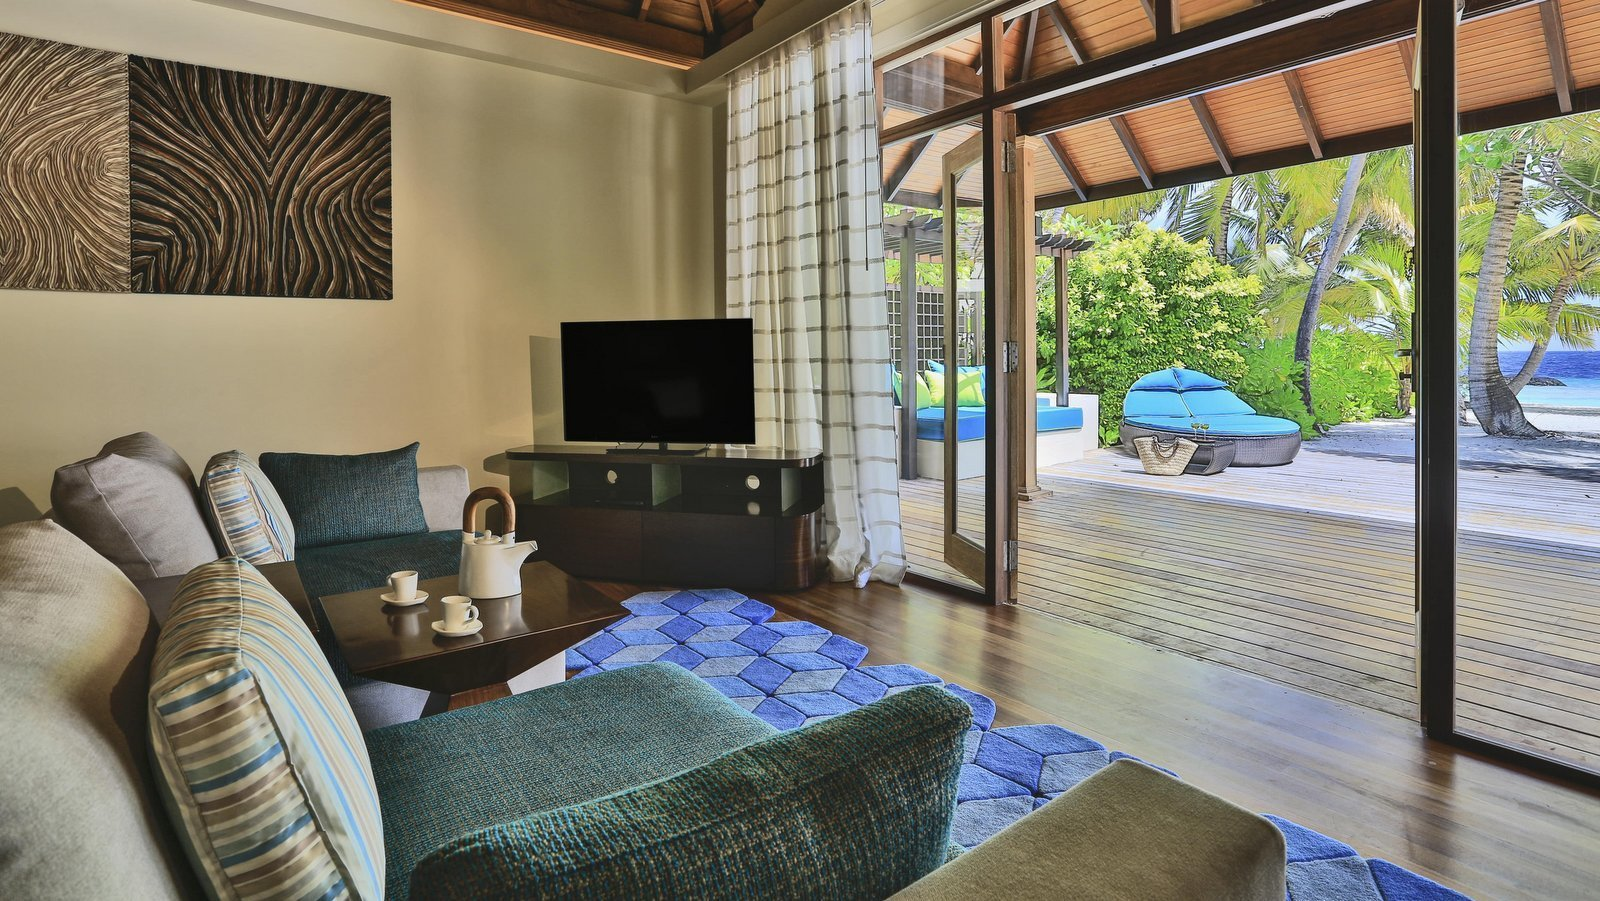 Мальдивы, отель Kurumba Maldives, номер Two Bed Room Kurumba Residence